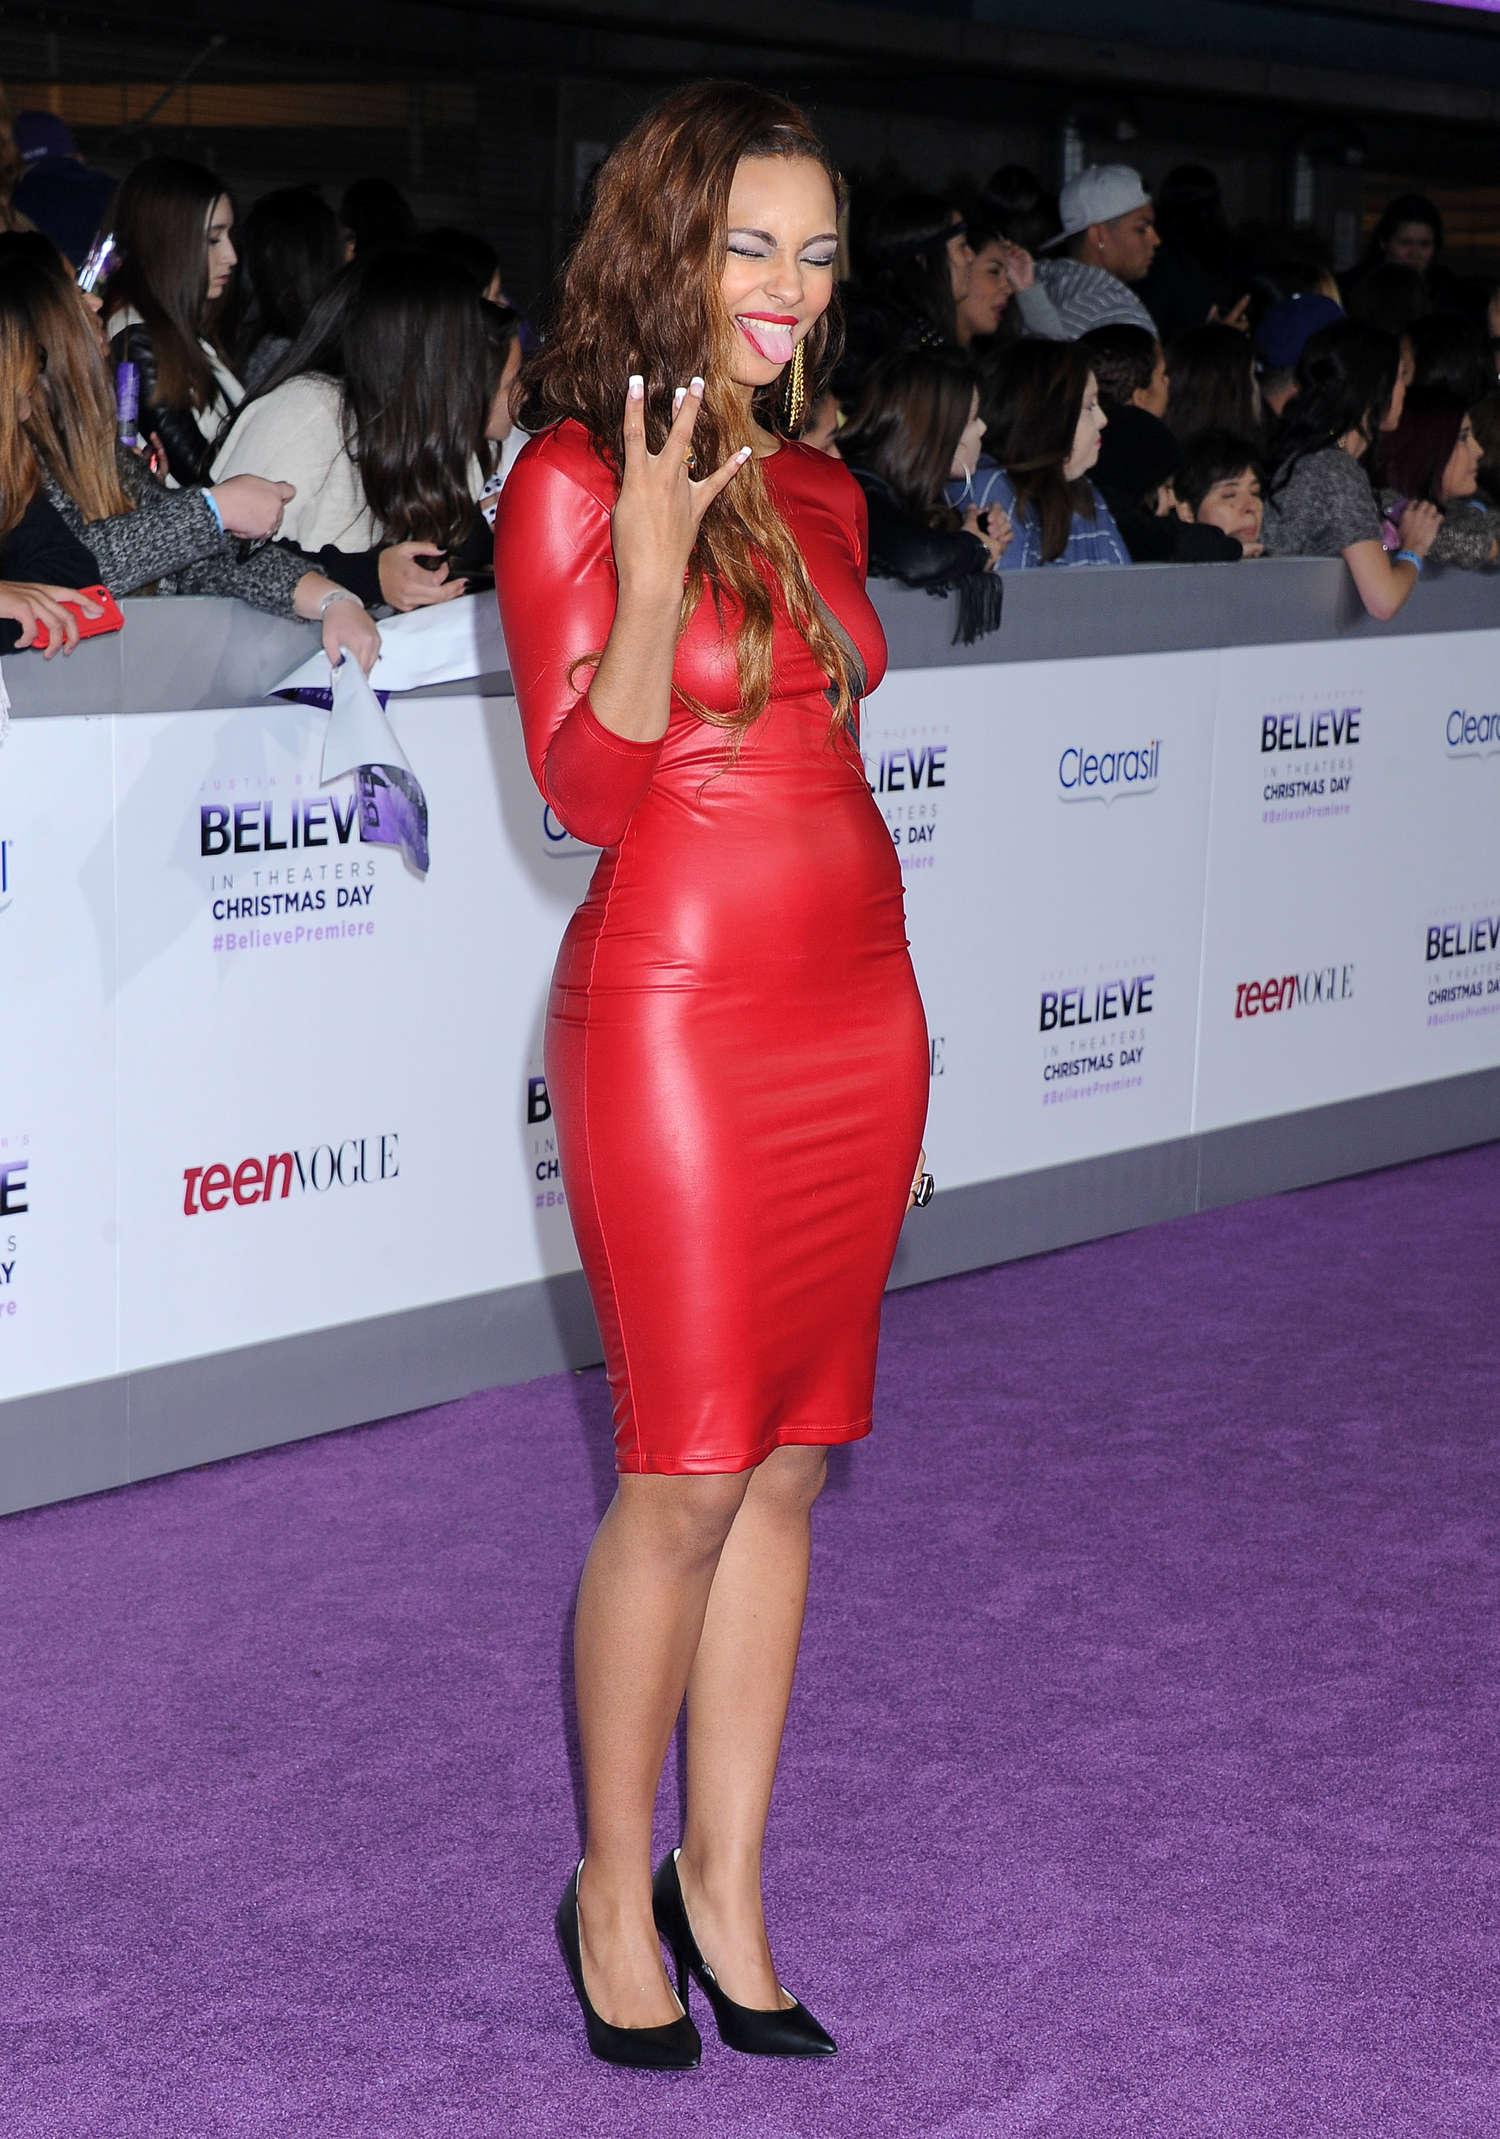 Jessica Jarrell  Justin Biebers Believe Premiere -06 - Full SizeJustin Bieber And Jessica Jarrell Kissing